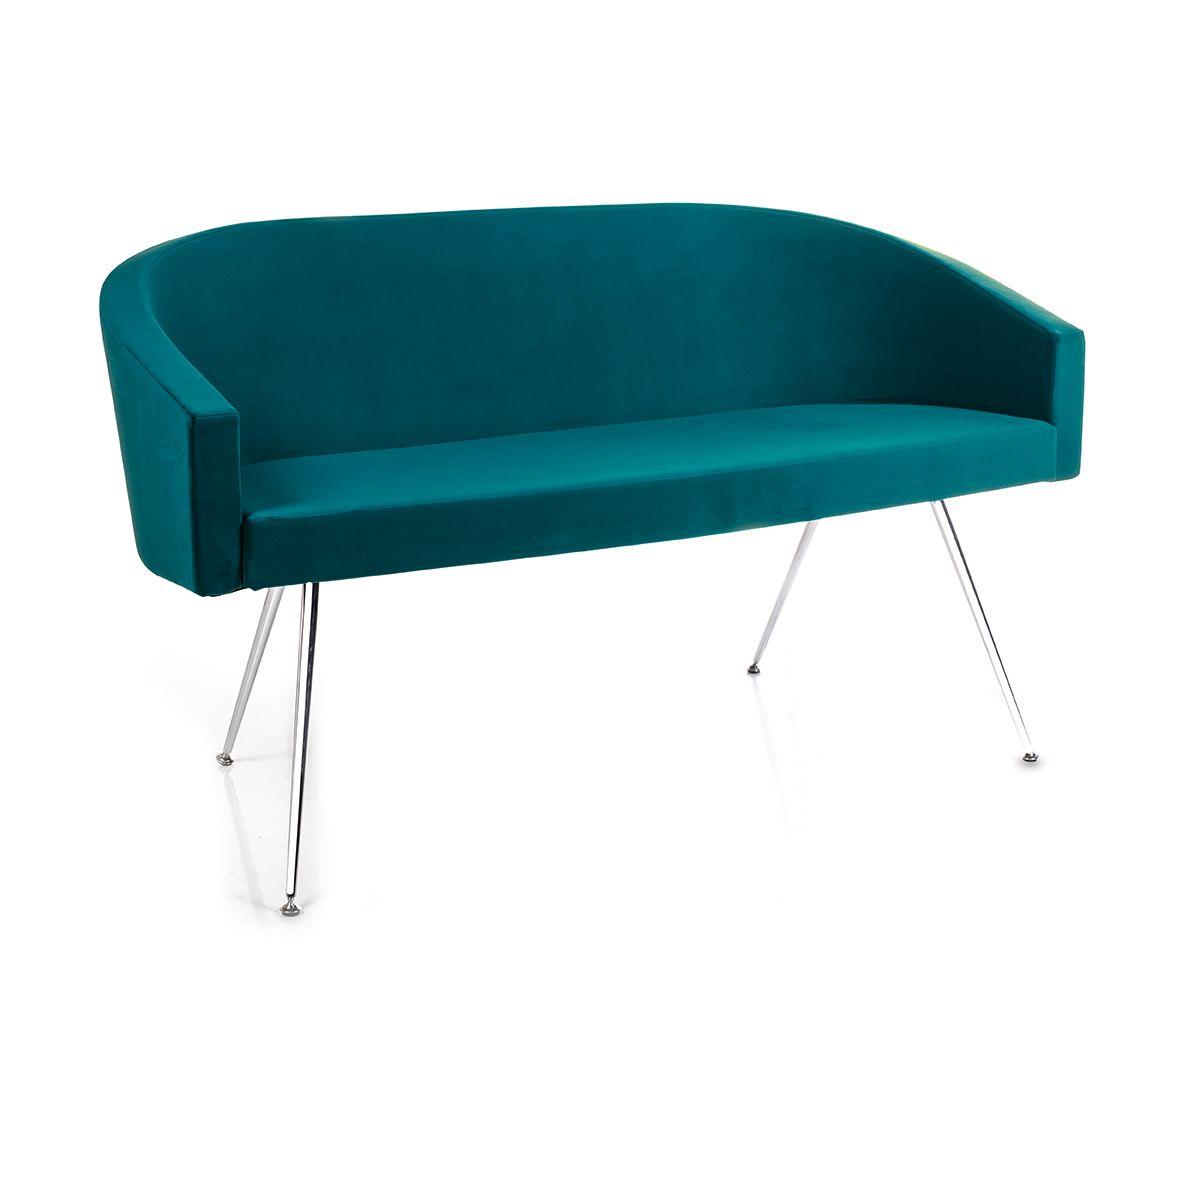 Coste's Sofa